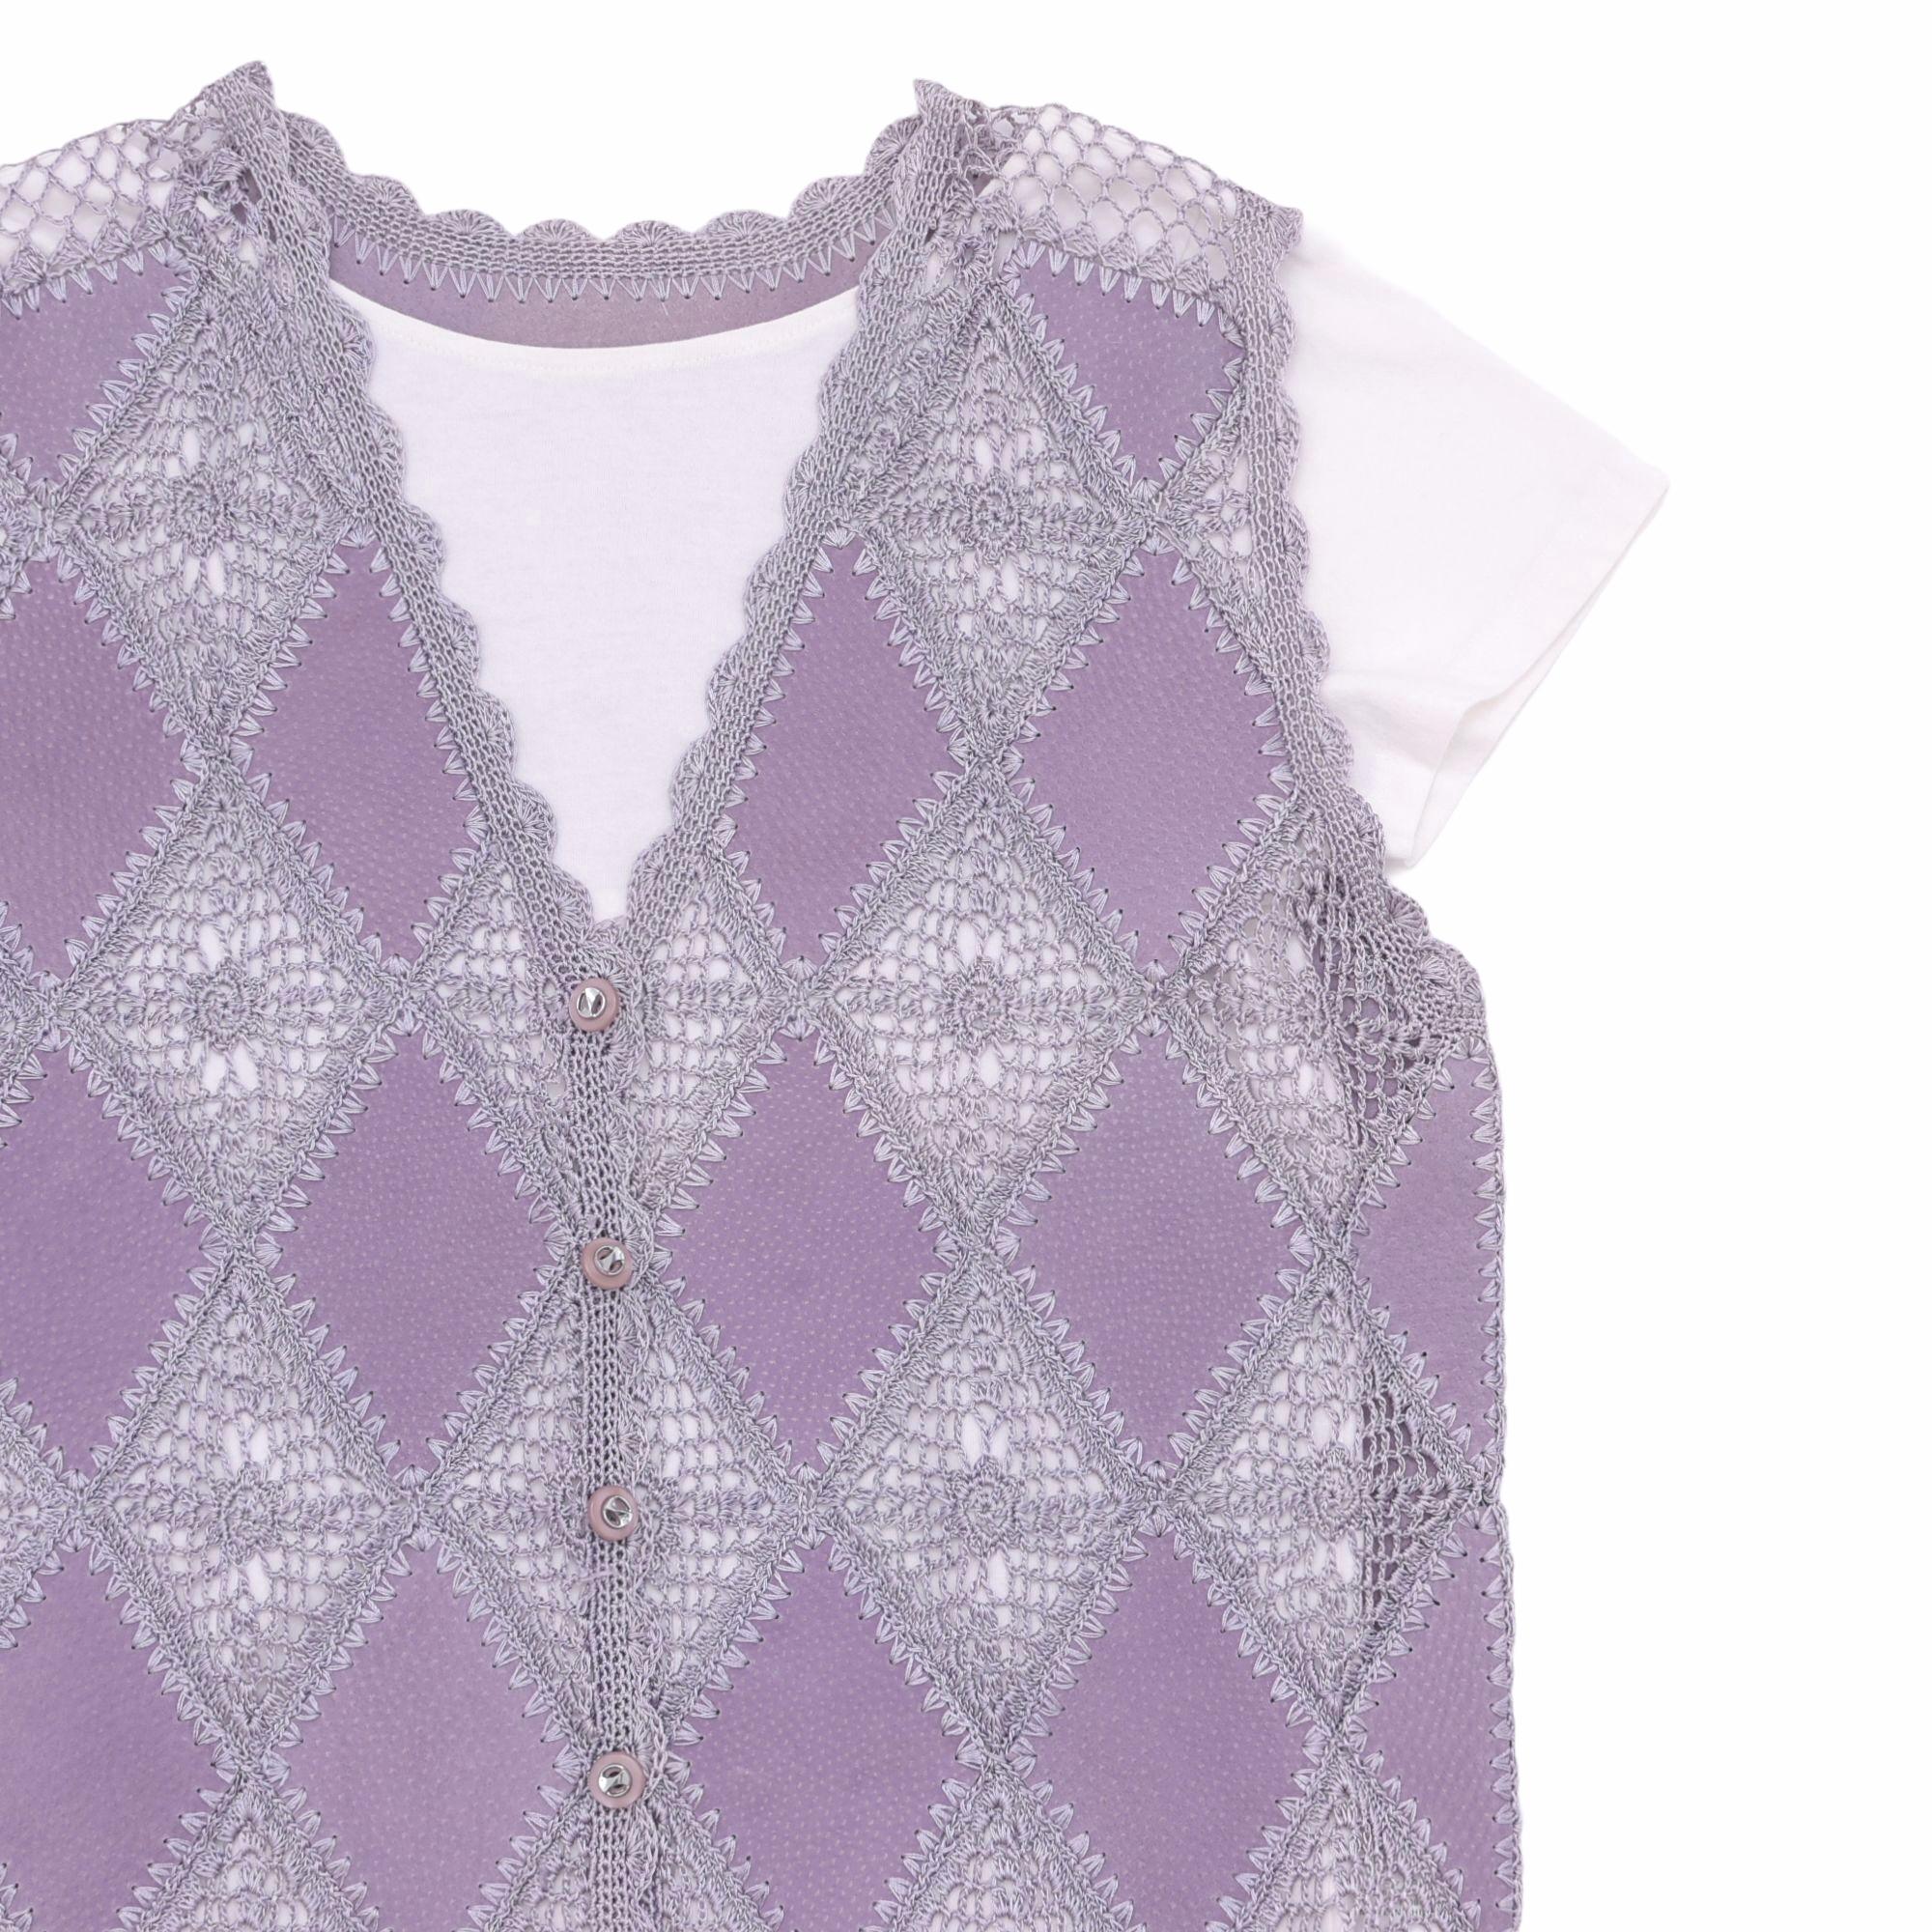 Suede & Crochet patchwork cardigan vest